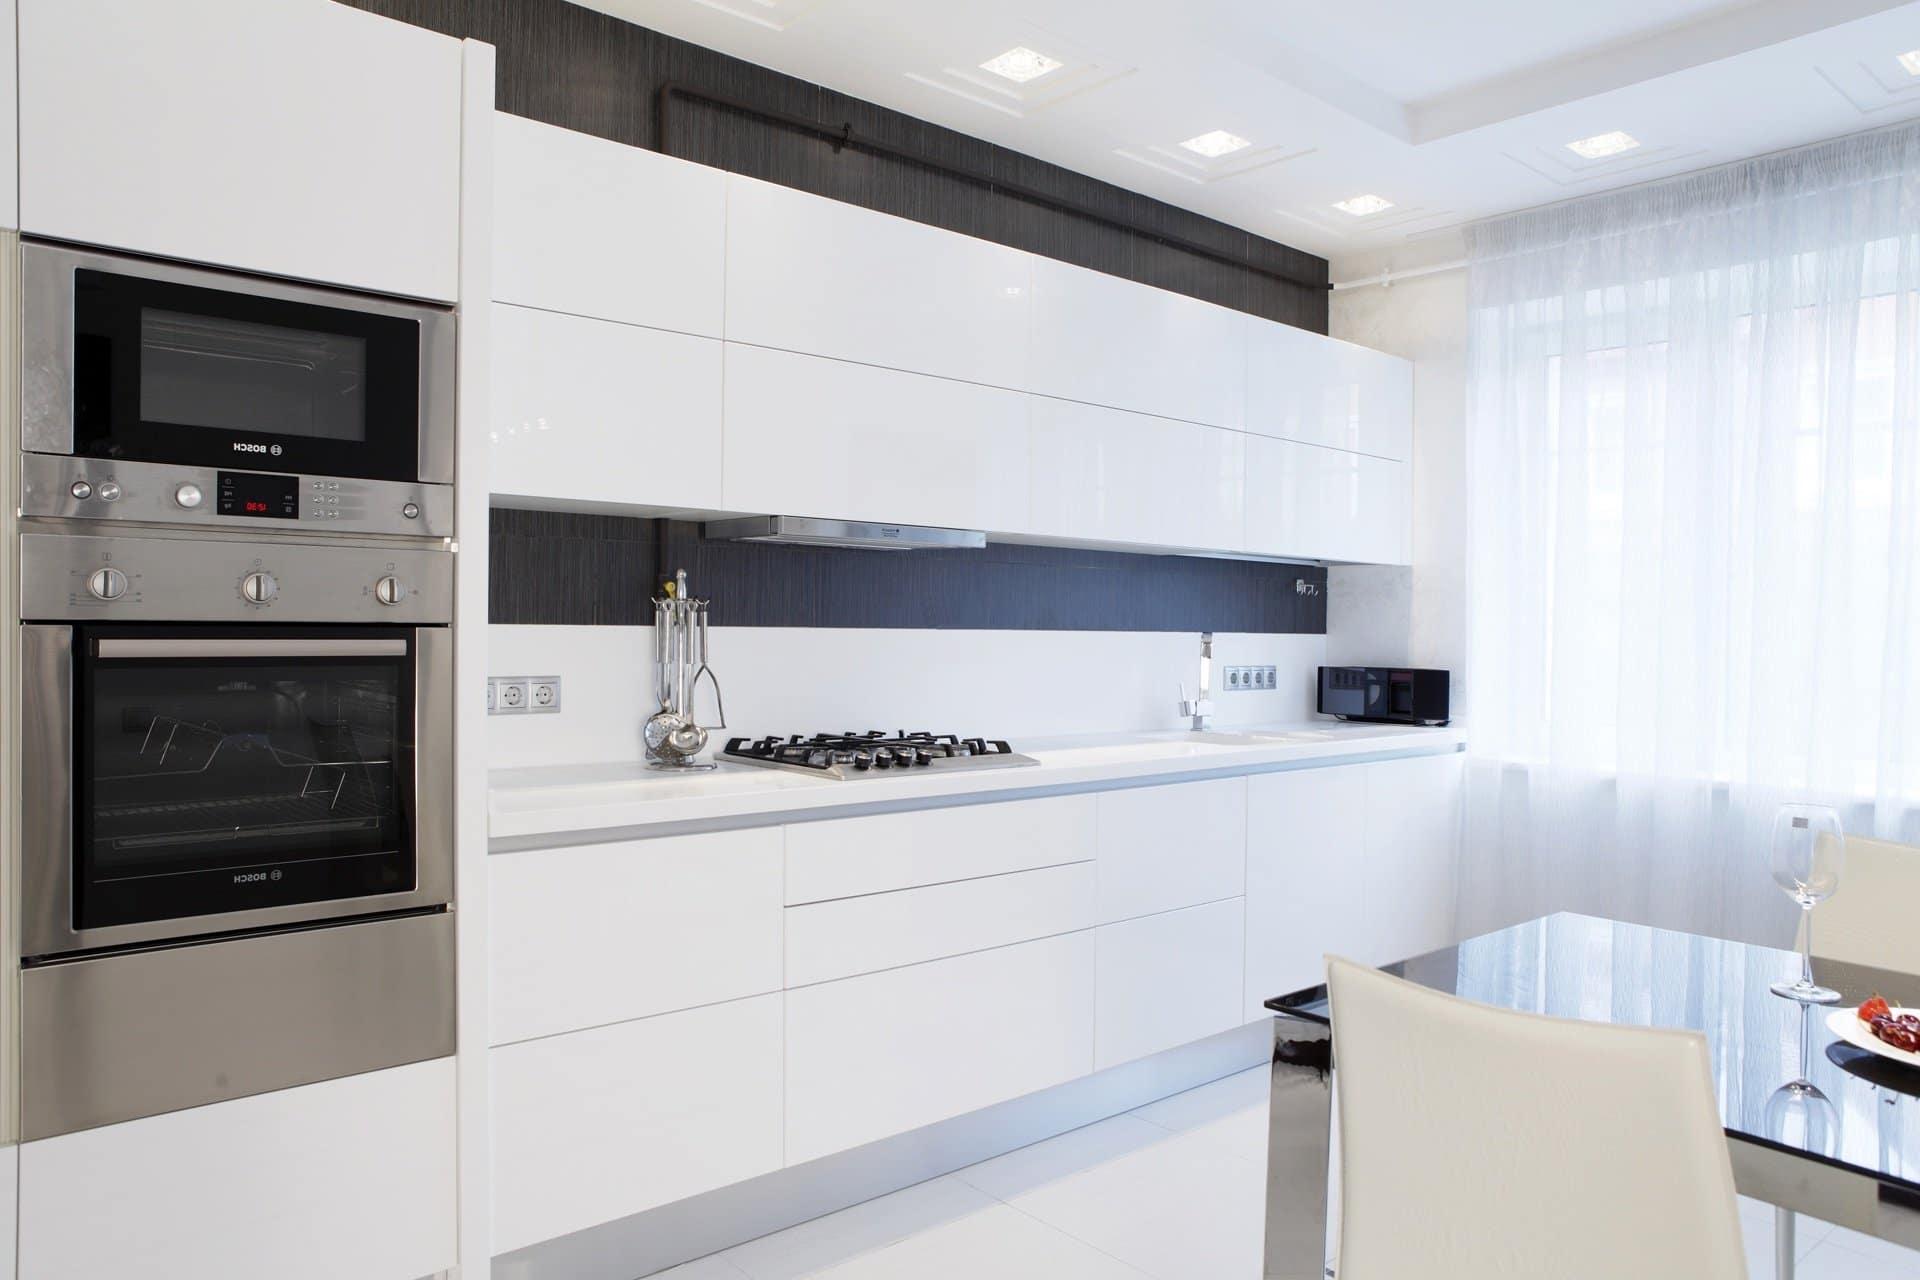 Дизайн кухни в стиле экологический минимализм